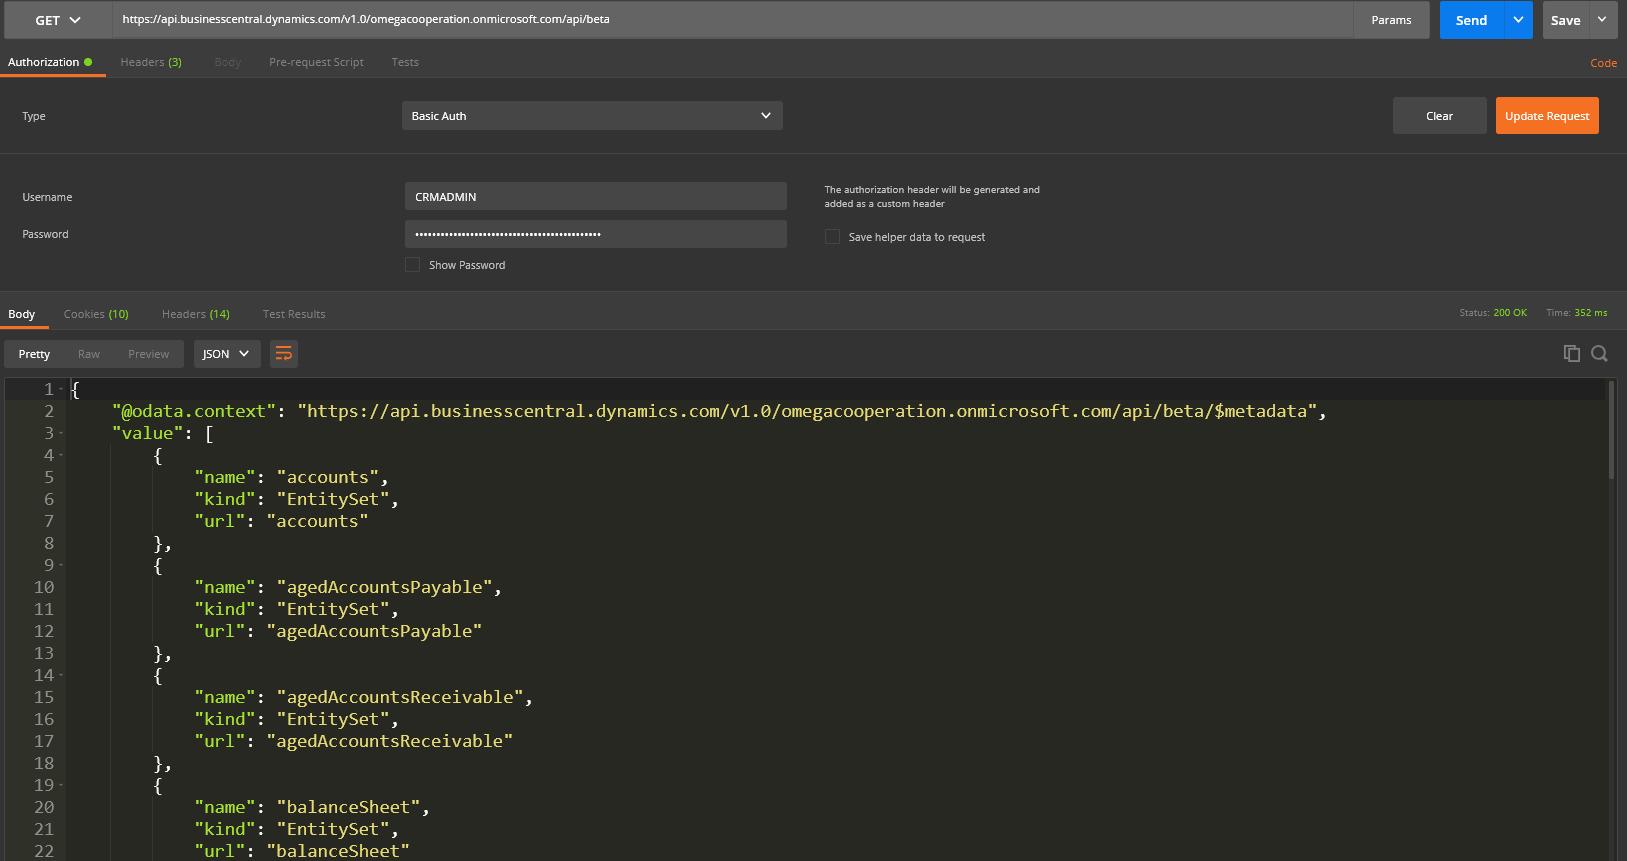 Explore Business Central API through Postman using Basic